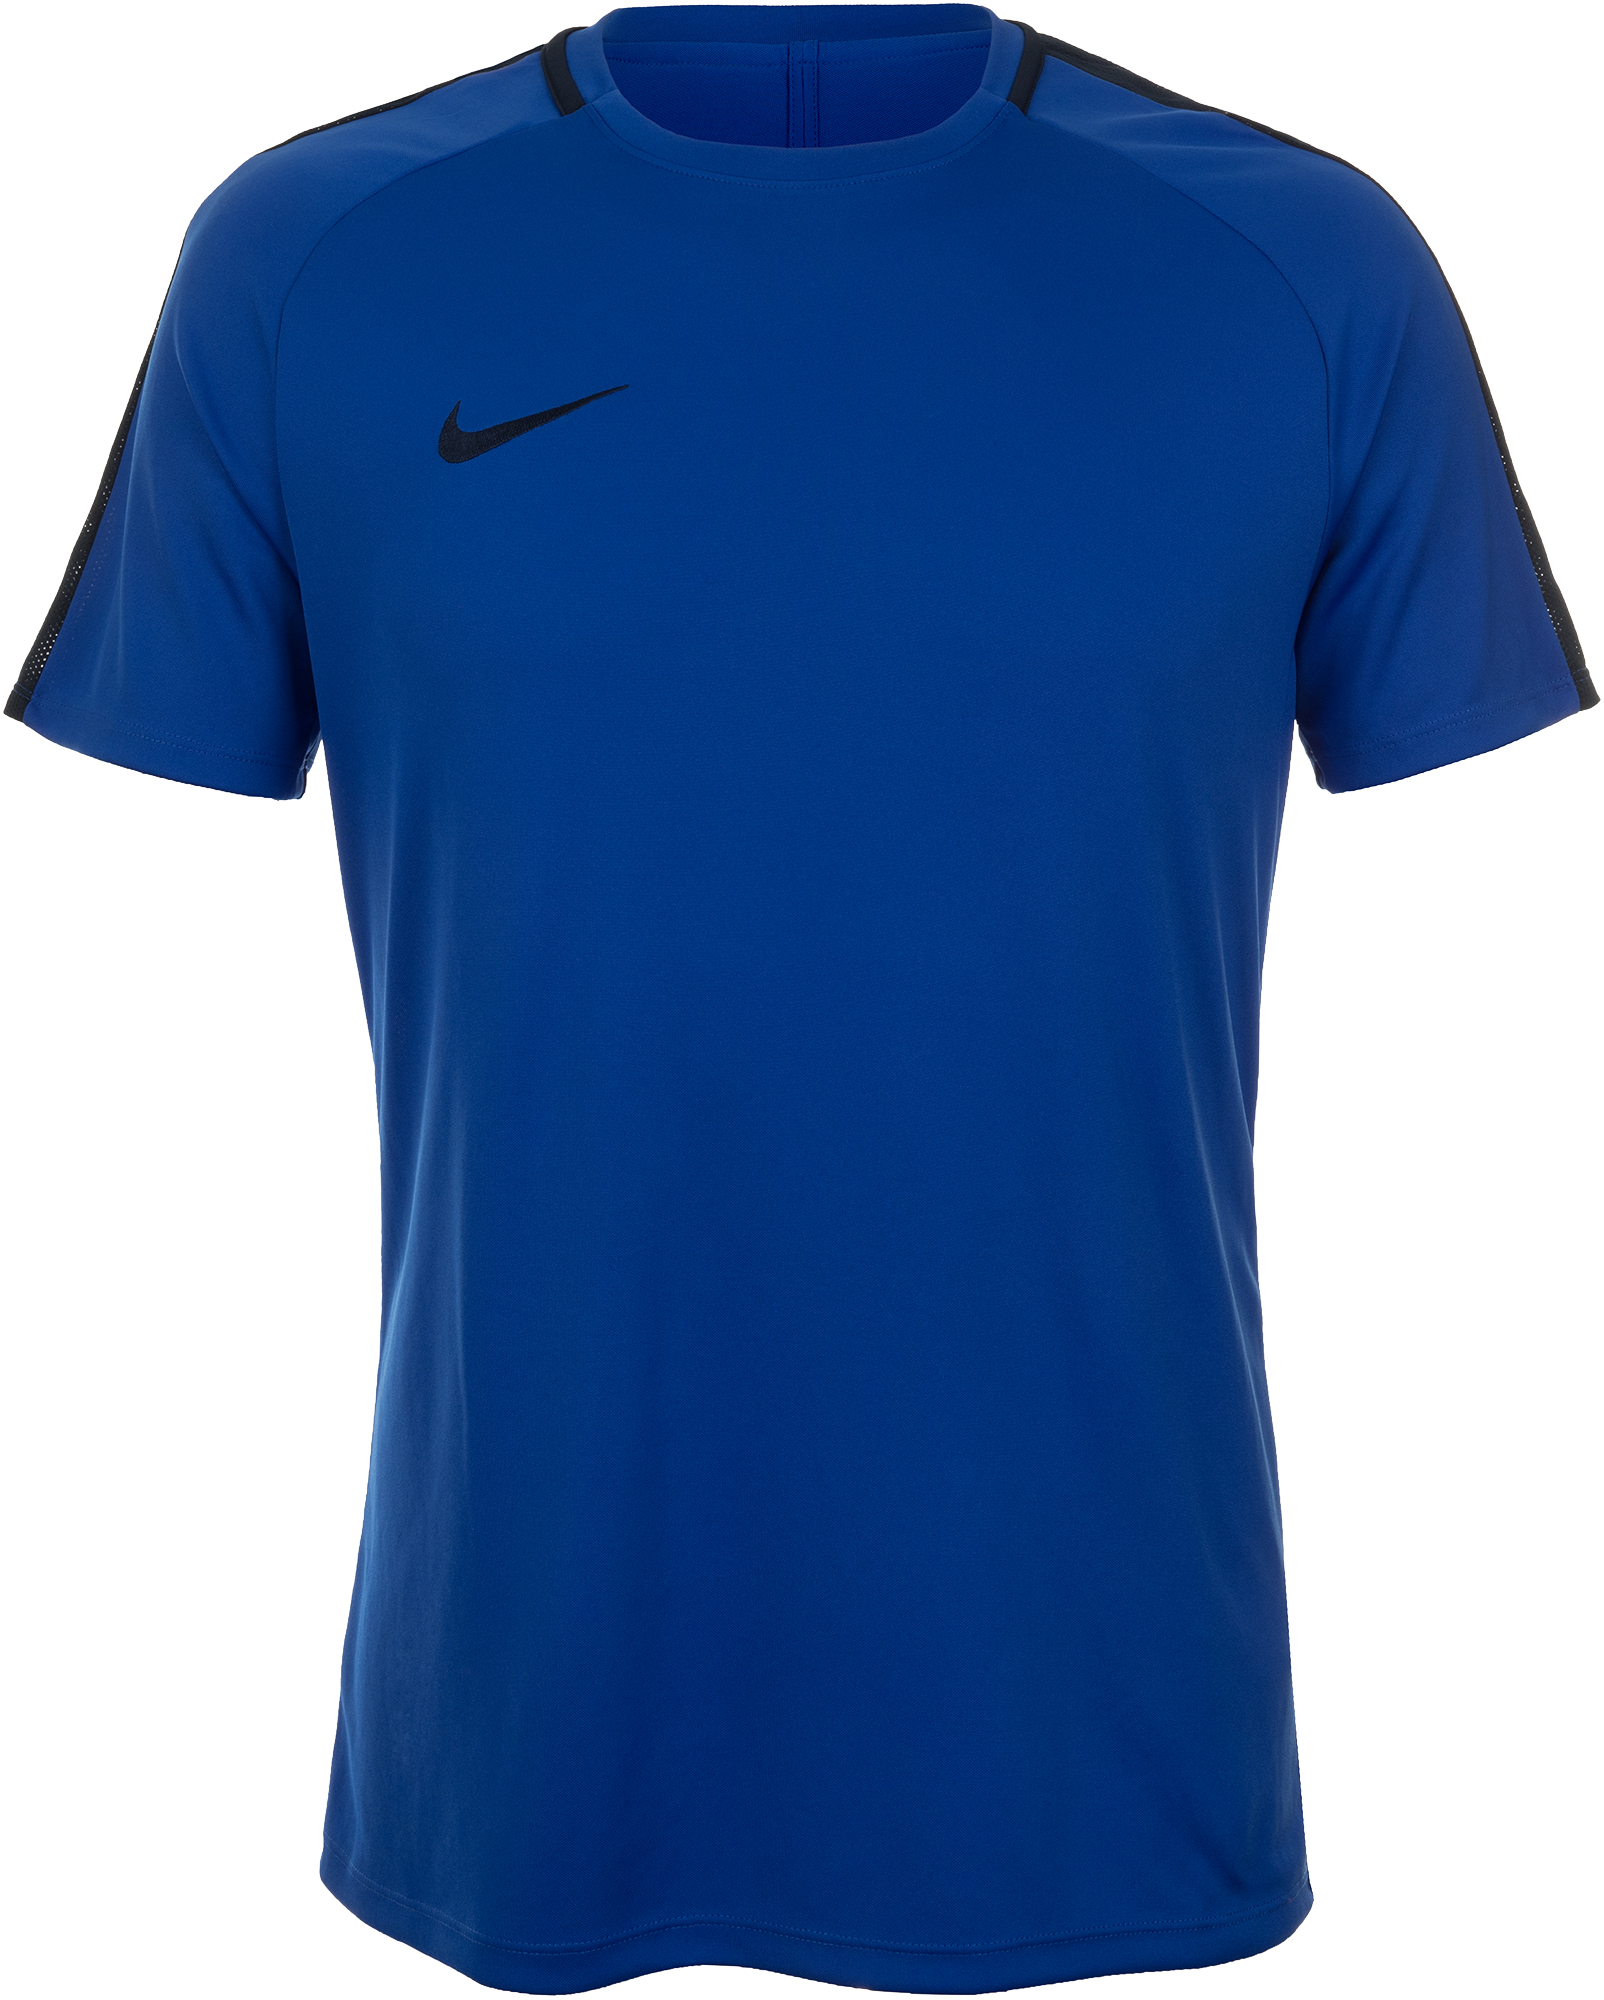 Nike Футболка мужская Nike Dry, размер 46-48 цена